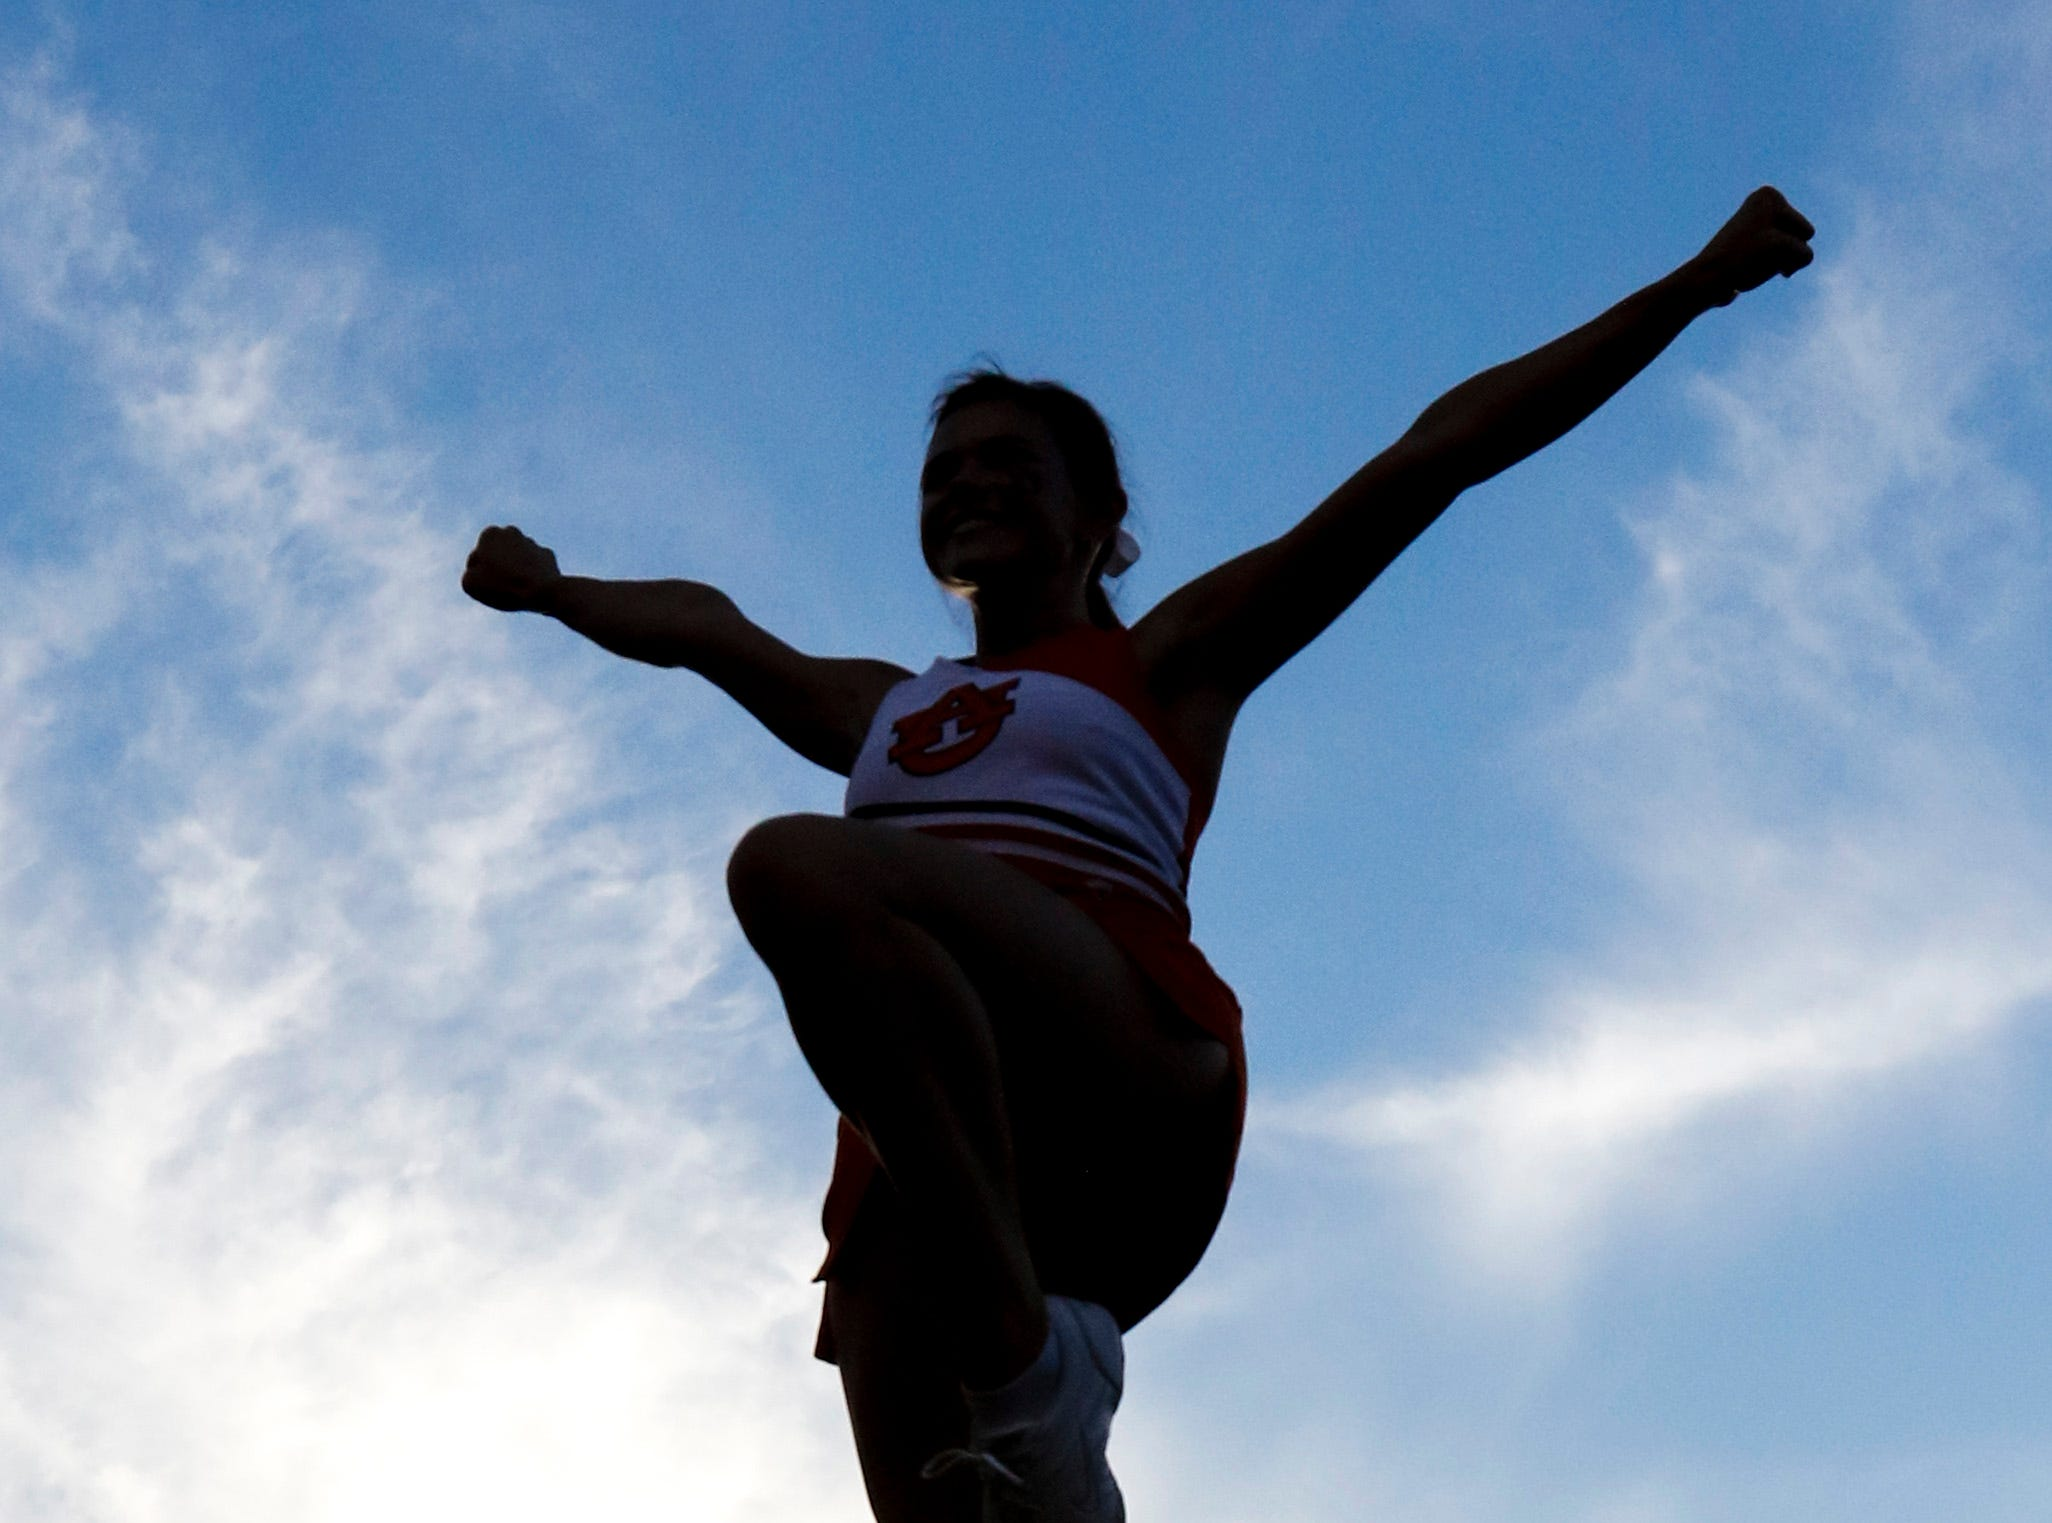 An Auburn  cheerleader performs before an NCAA college football game against Arkansas State, Saturday, Sept. 10, 2016, in Auburn, Ala. (AP Photo/Butch Dill)